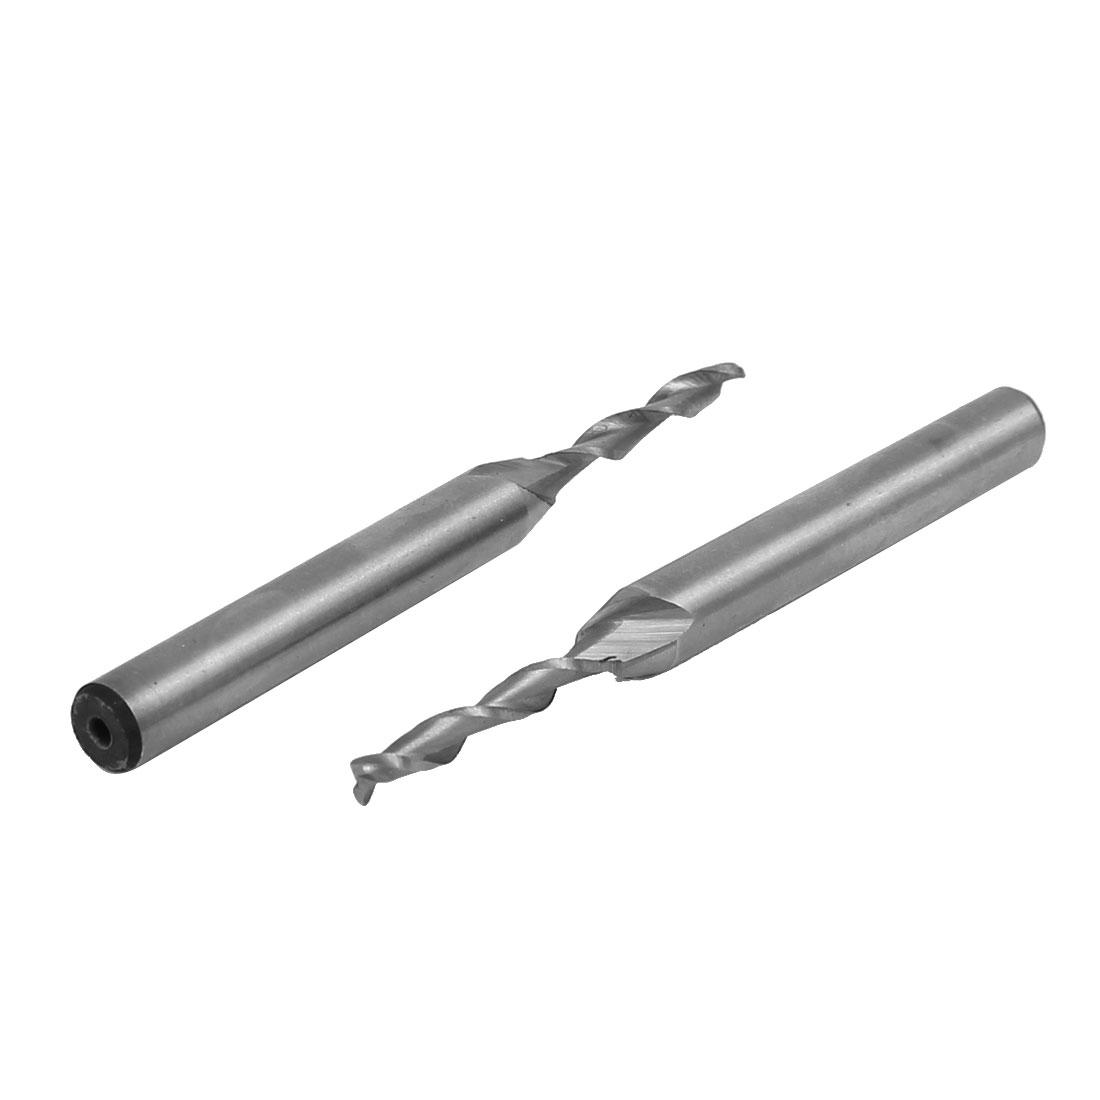 3mm Cutting Dia 6mm Shank Dia HSS Double Flutes End Mills Cutter 2pcs